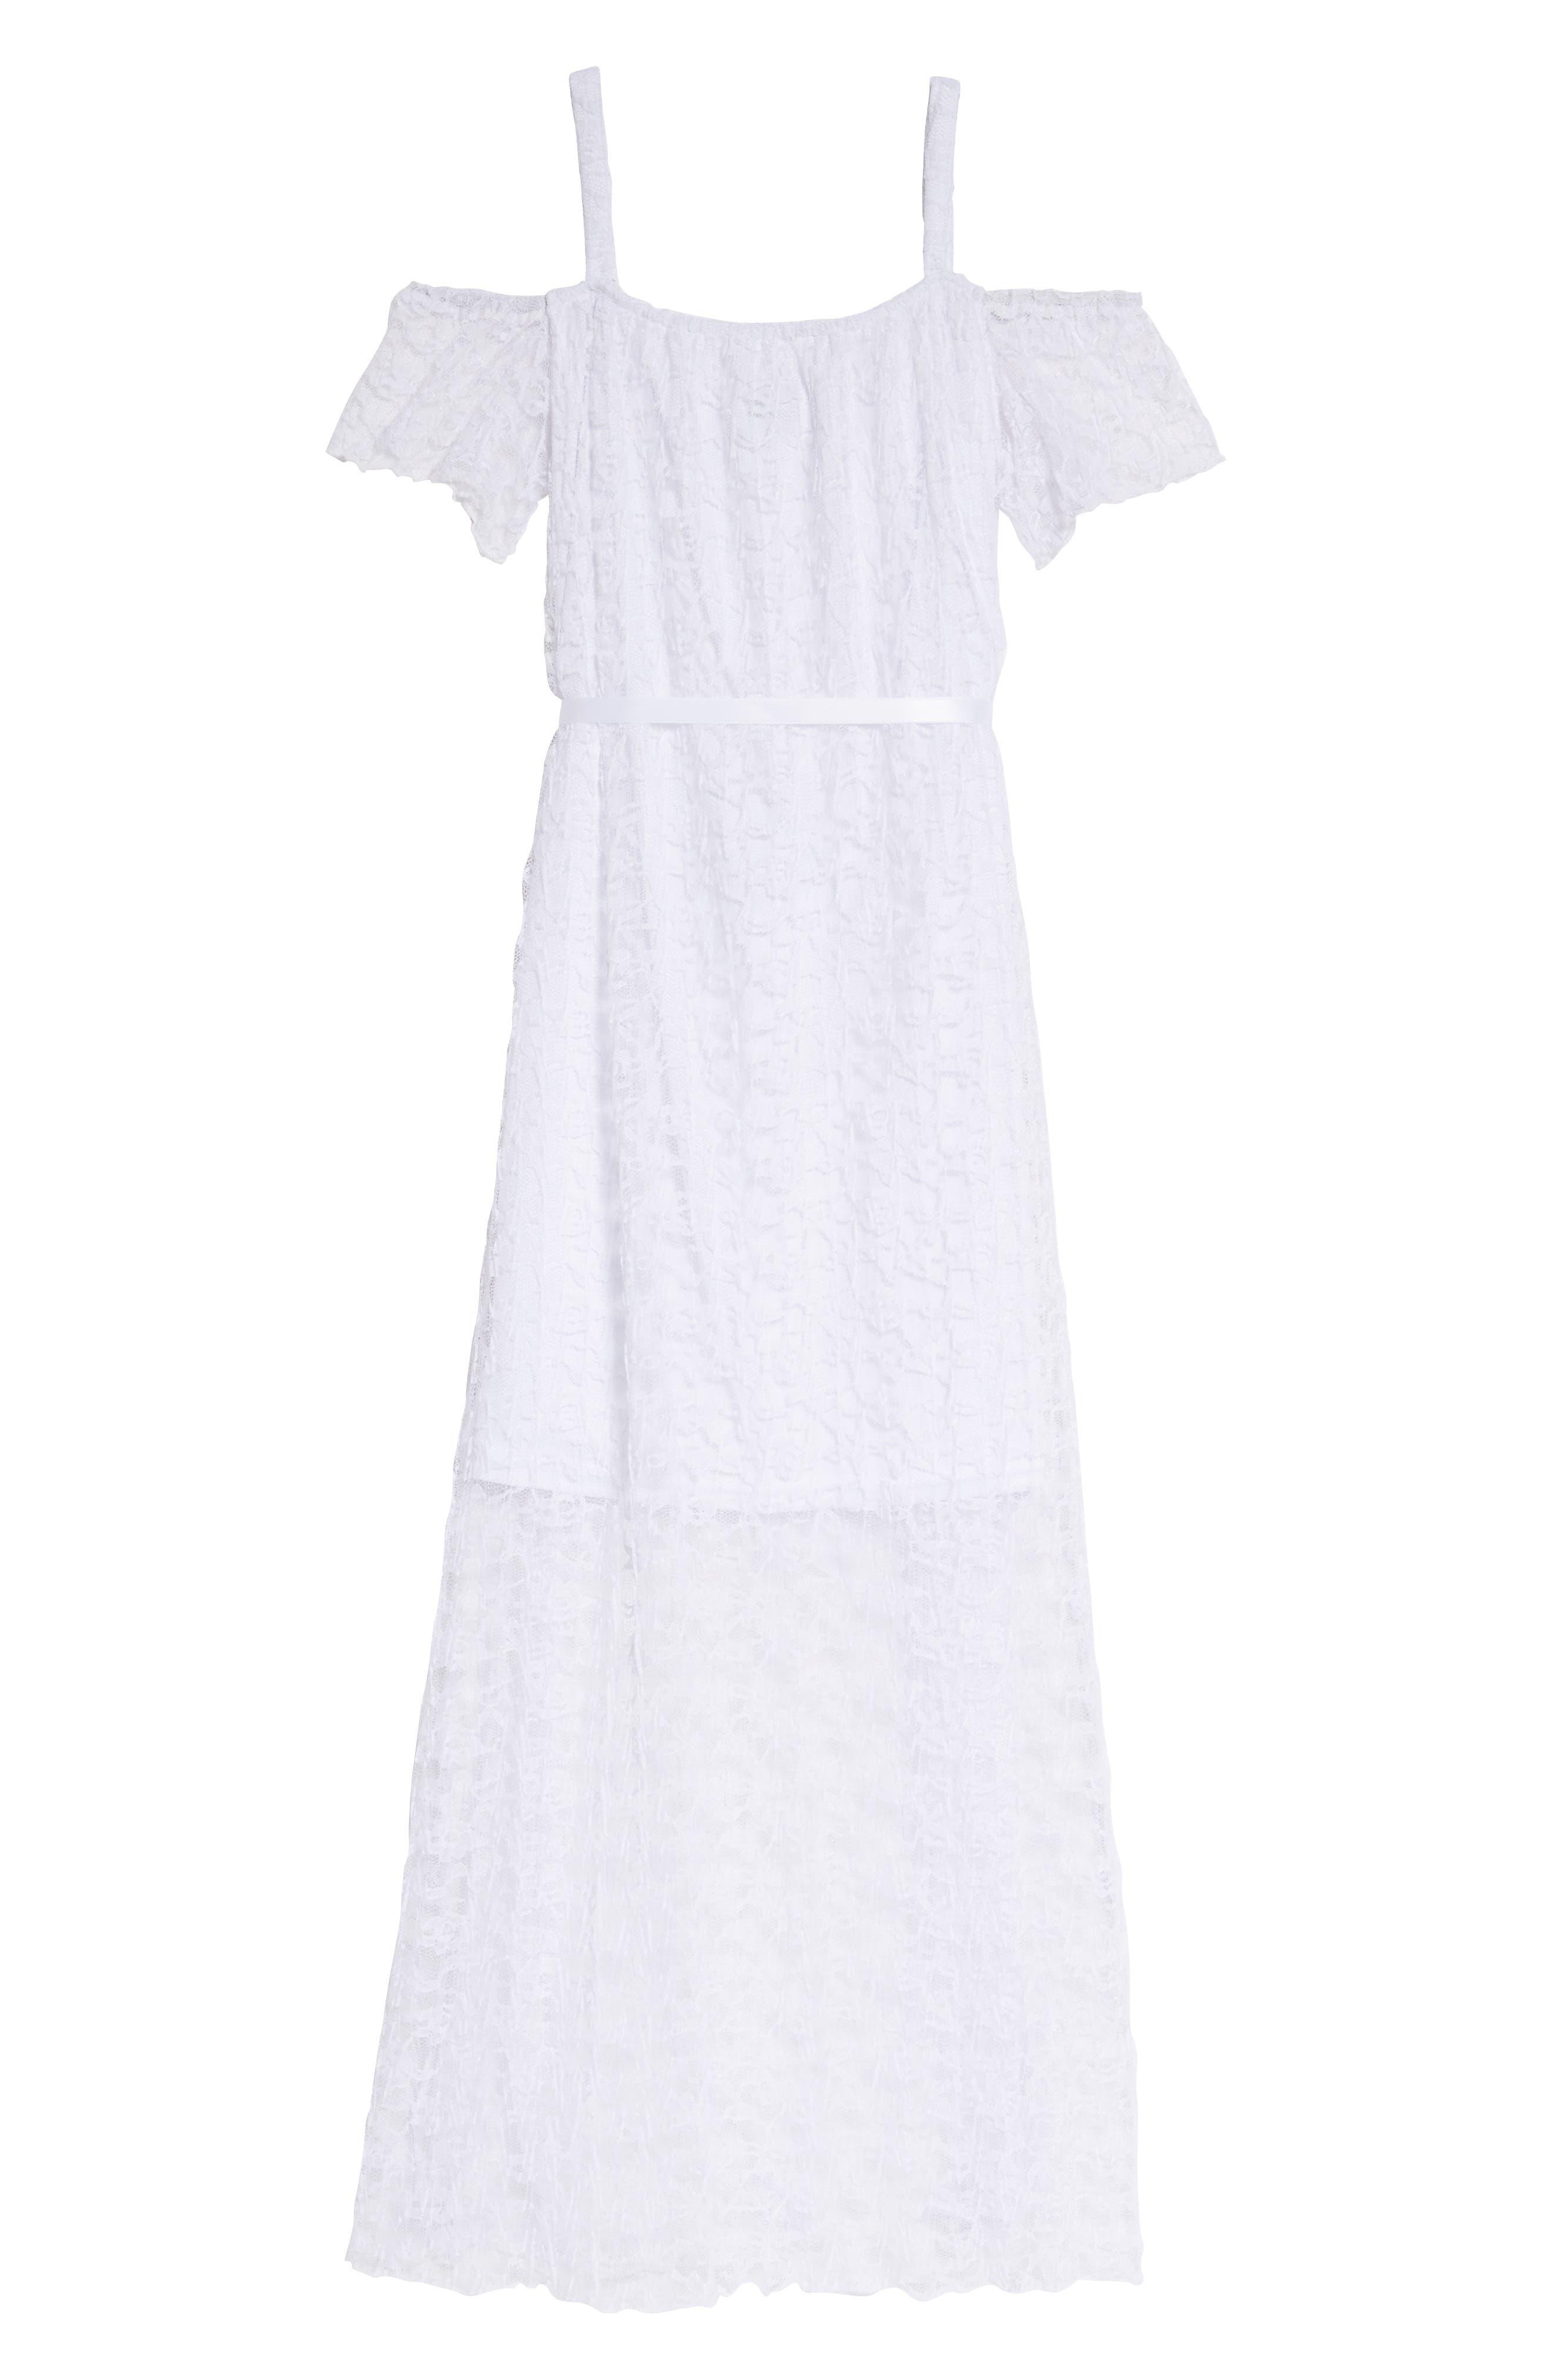 Main Image - BLUSH by Us Angels Lace Cold Shoulder Maxi Dress (Big Girls)